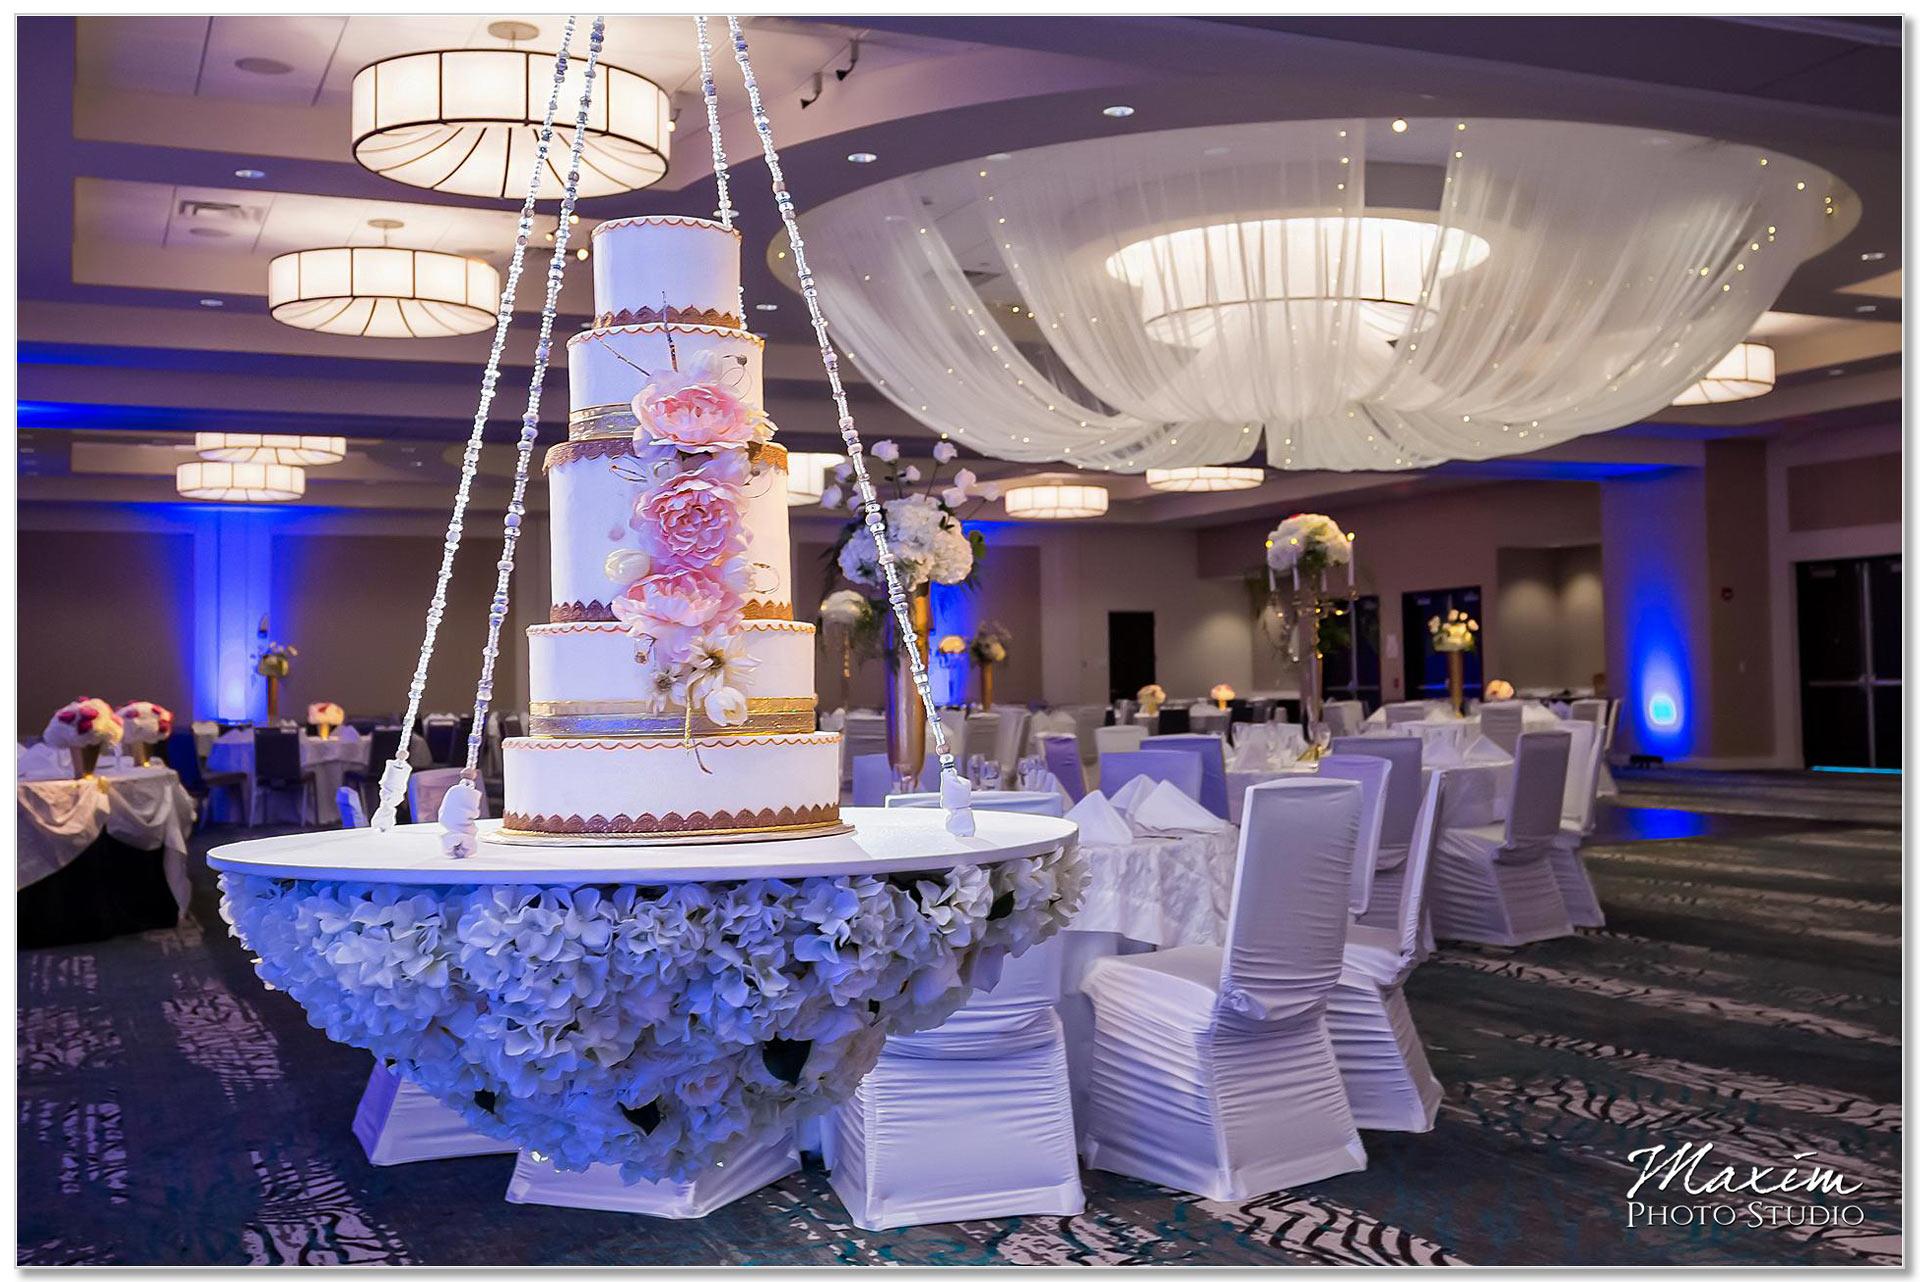 Centre Park West Holiday Inn Wedding Decor reception Cake